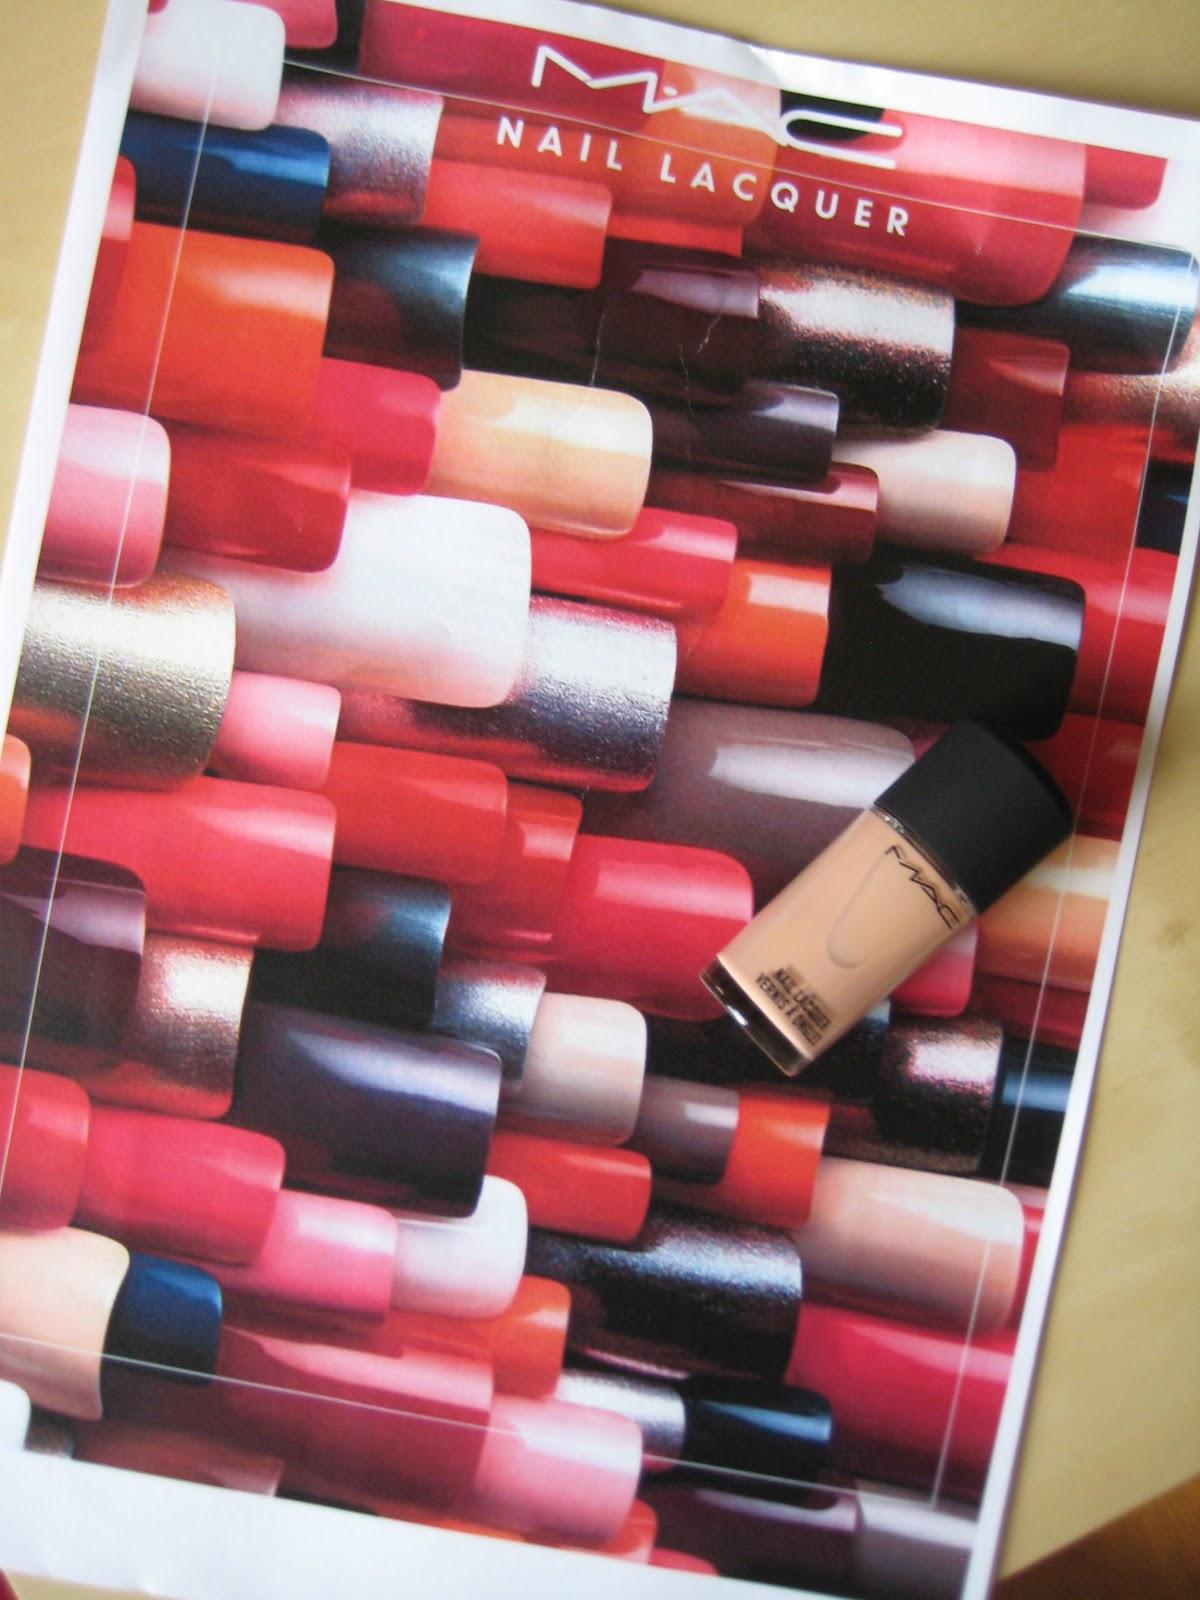 Past, Present, Future: MAC Nail Lacquer Collection - Nail